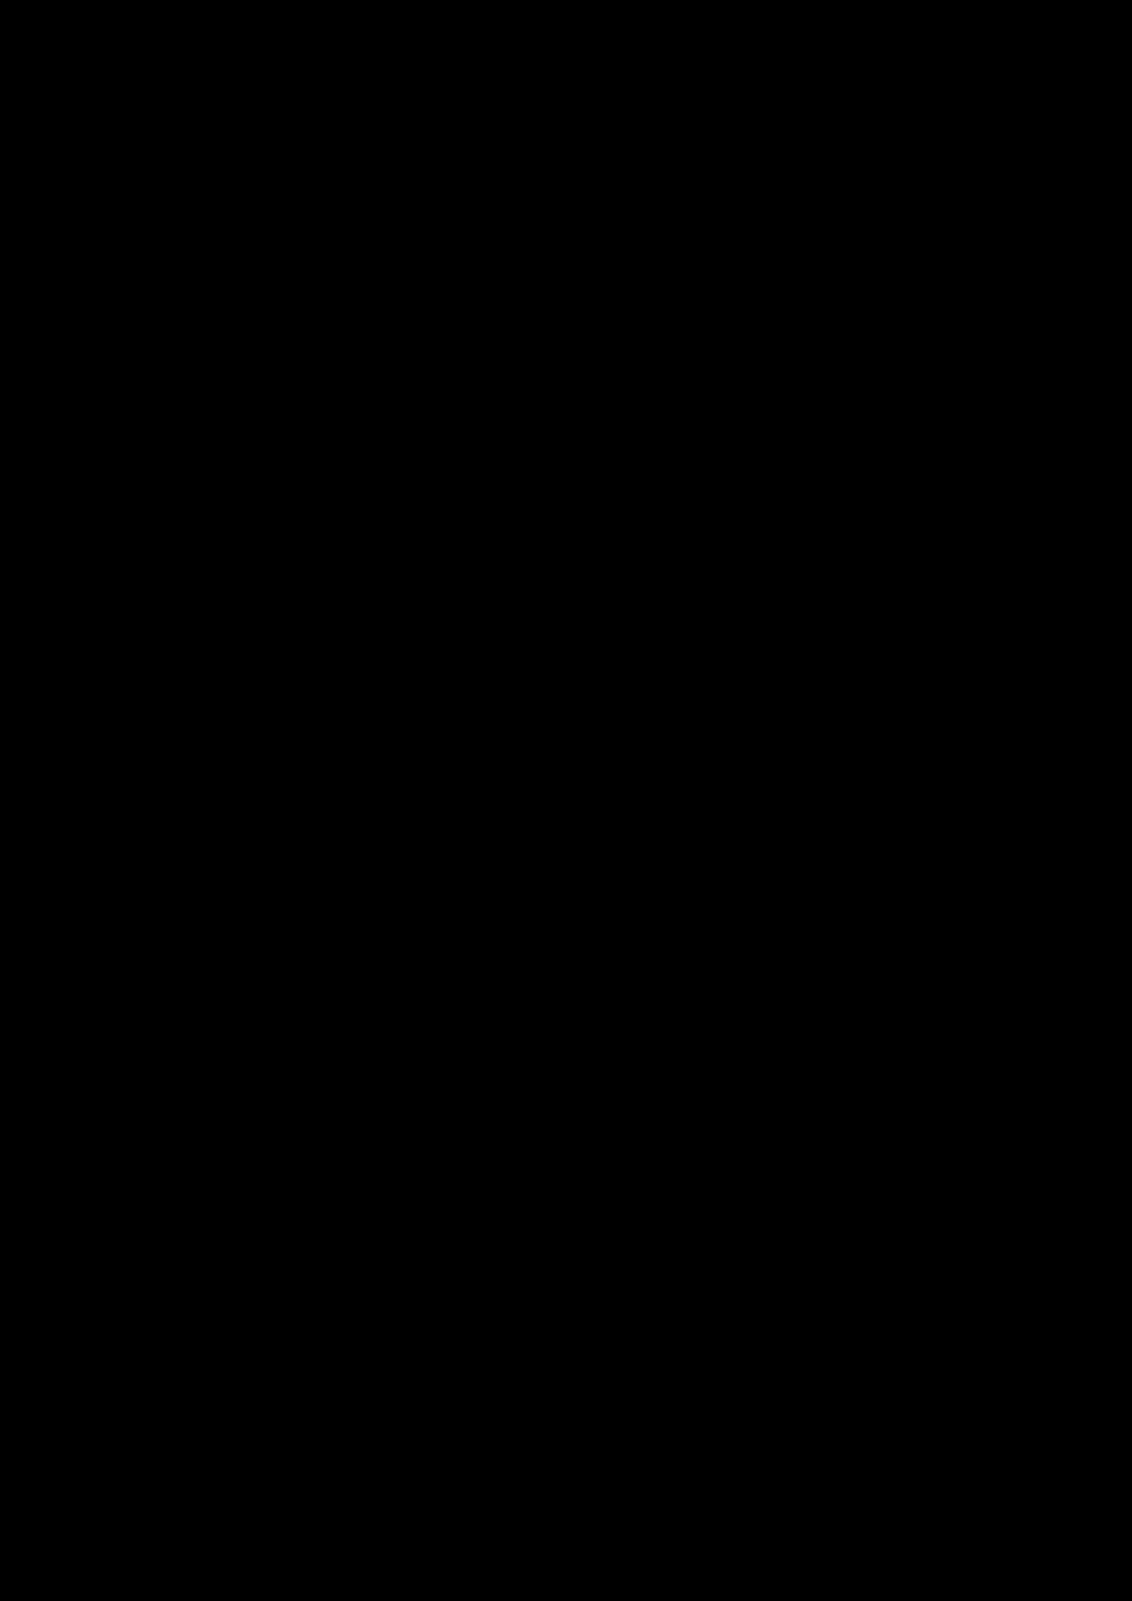 CHujina slide, Image 9